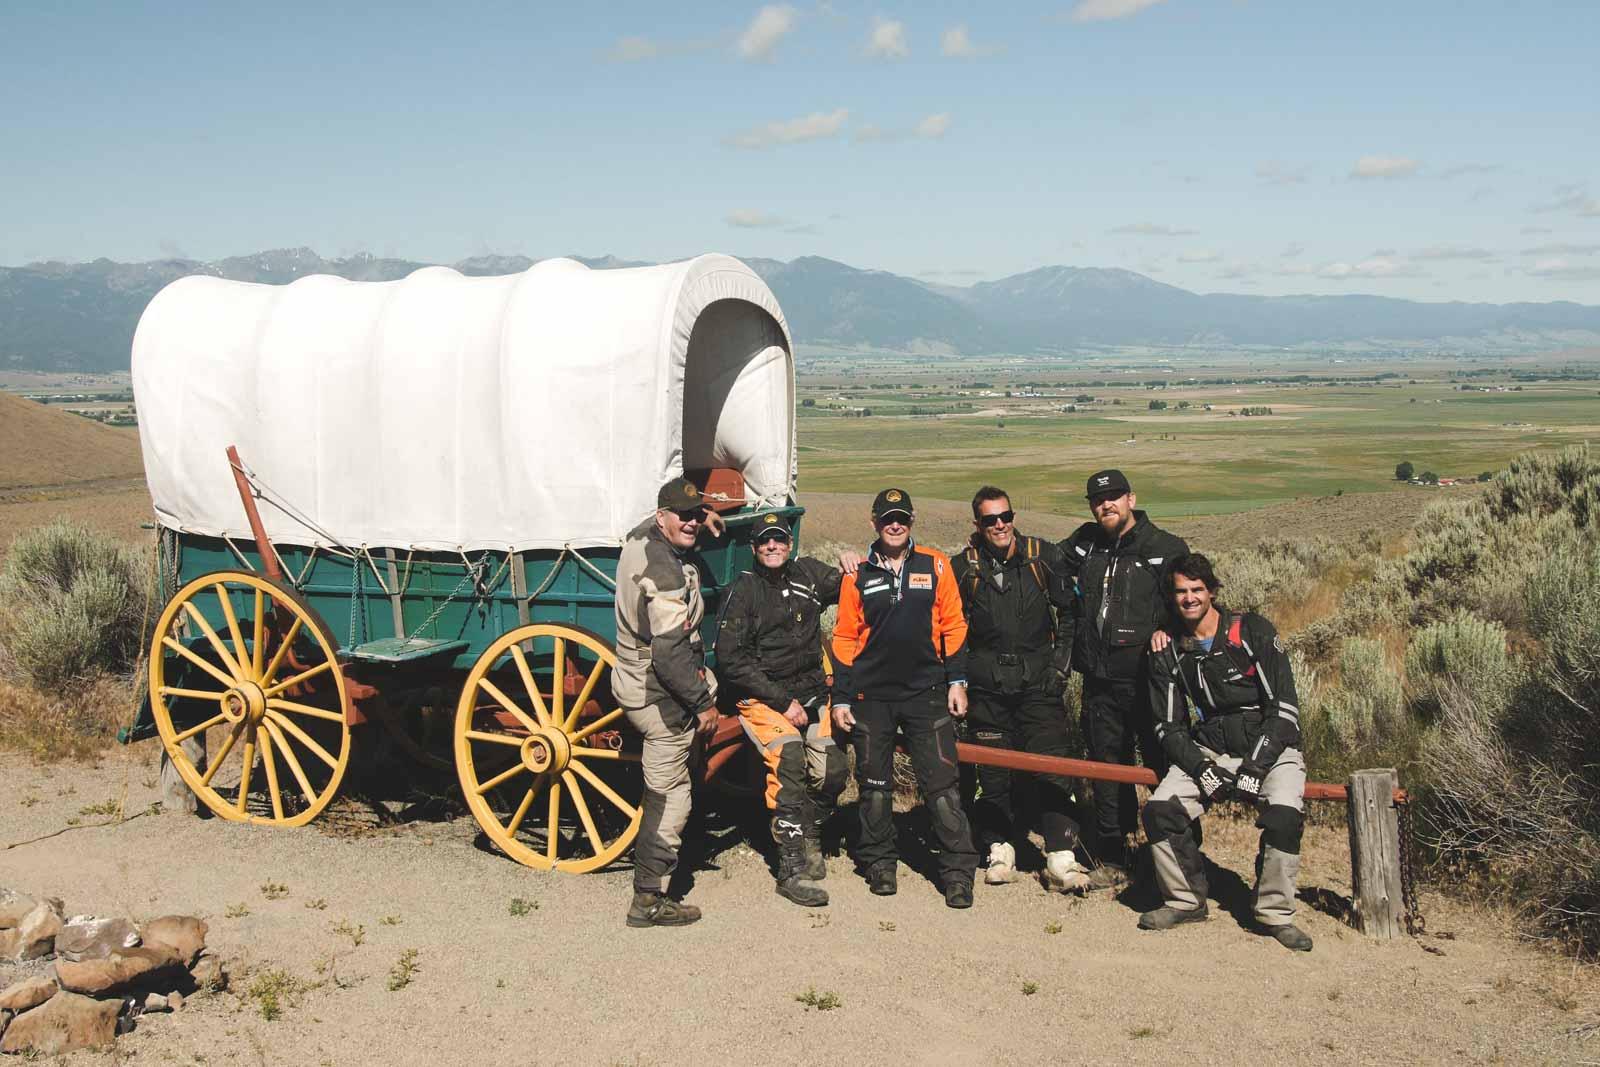 adv-pioneers-adventure-motorcycle-tour-oregon